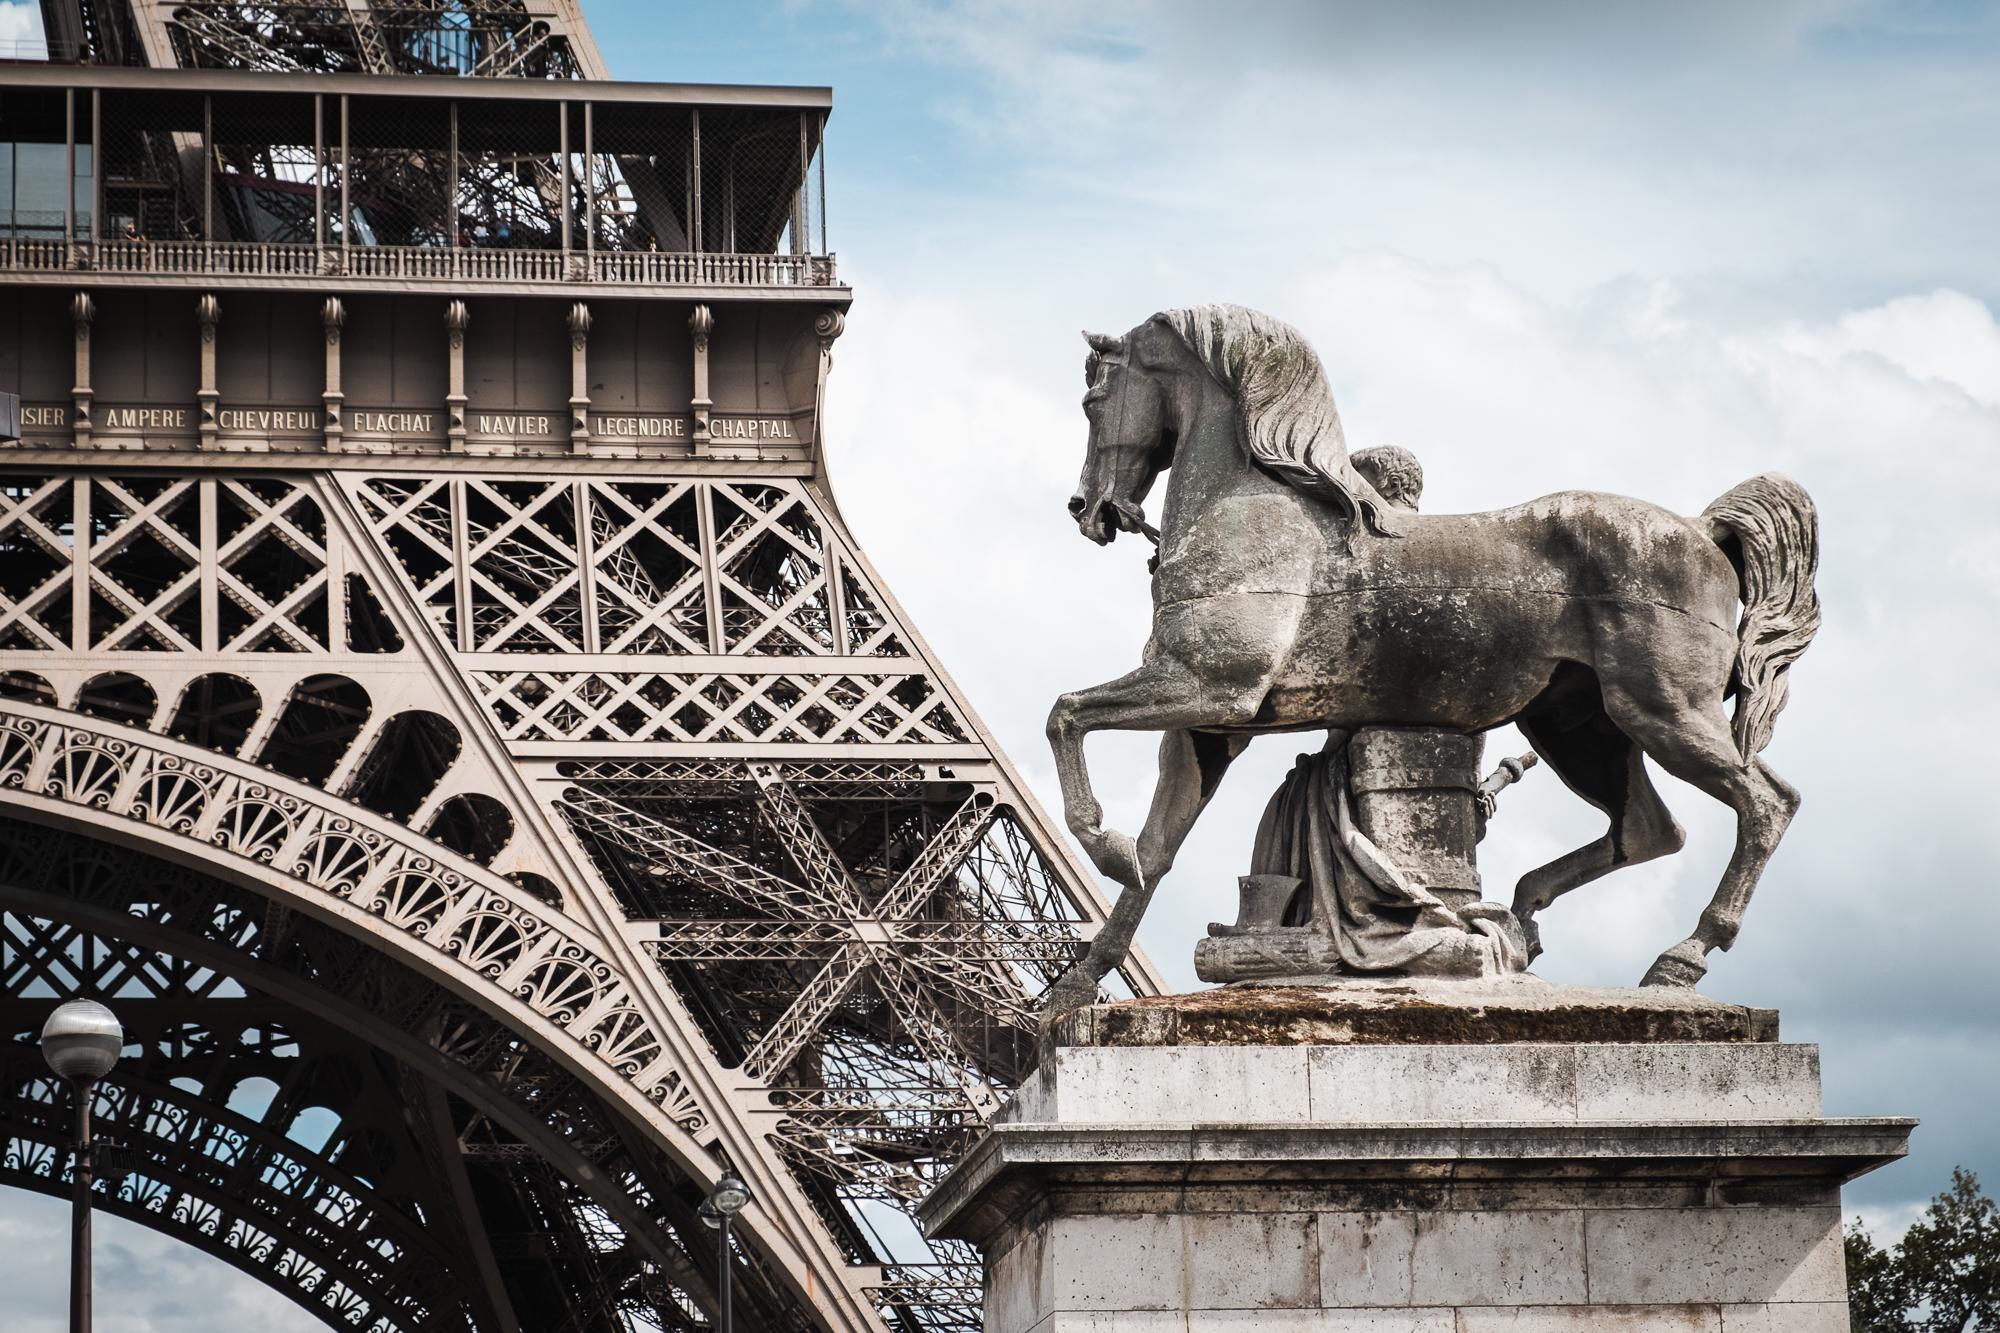 TS -180730 - Paris - 009.jpg